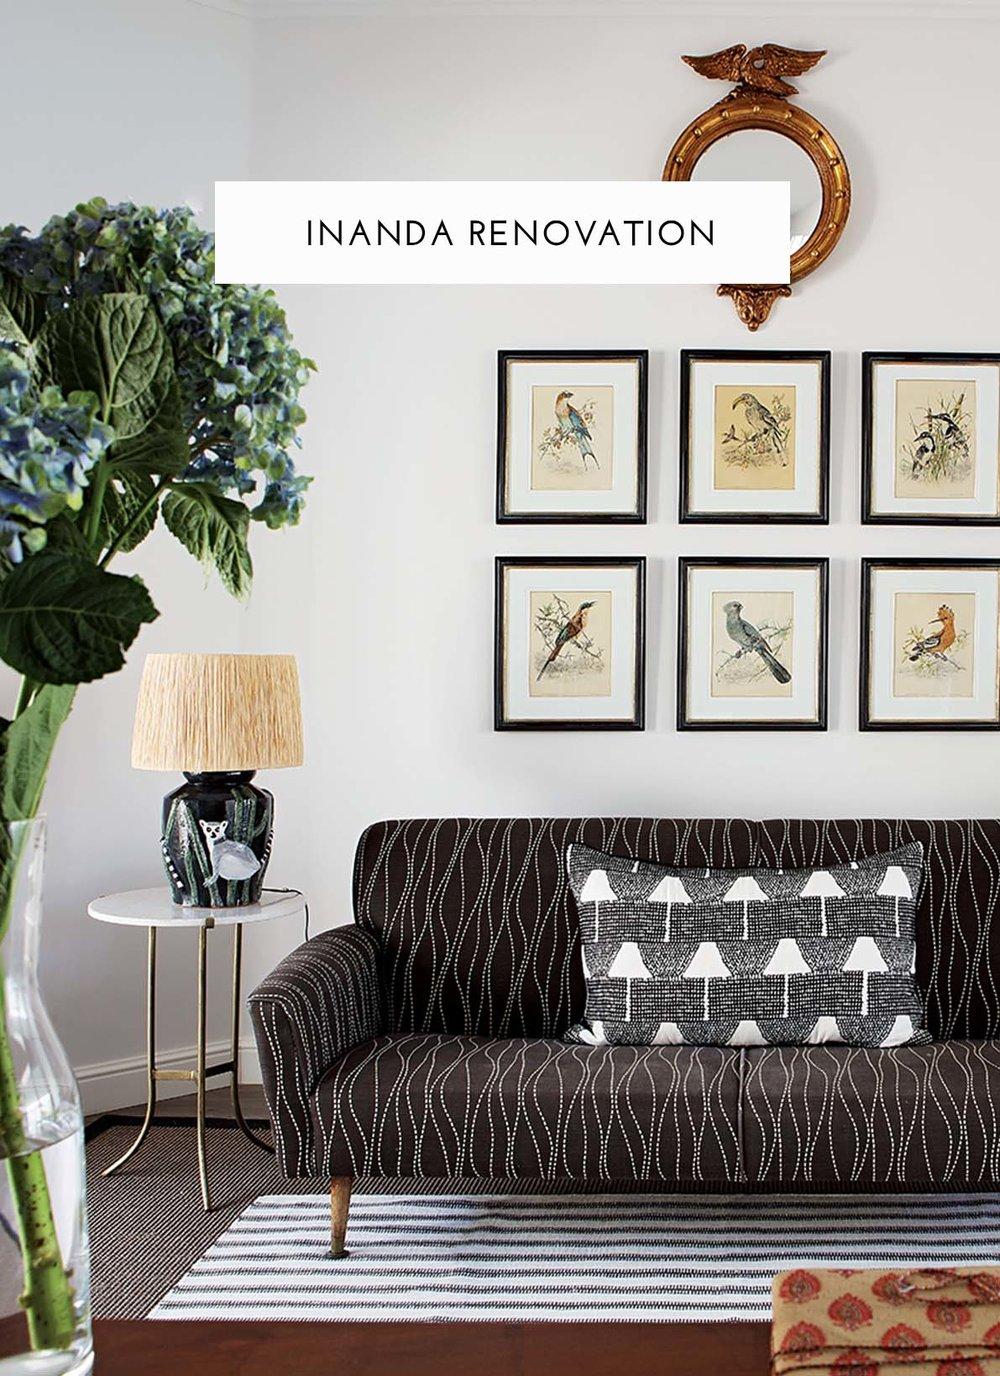 Inanda renovation4.jpg